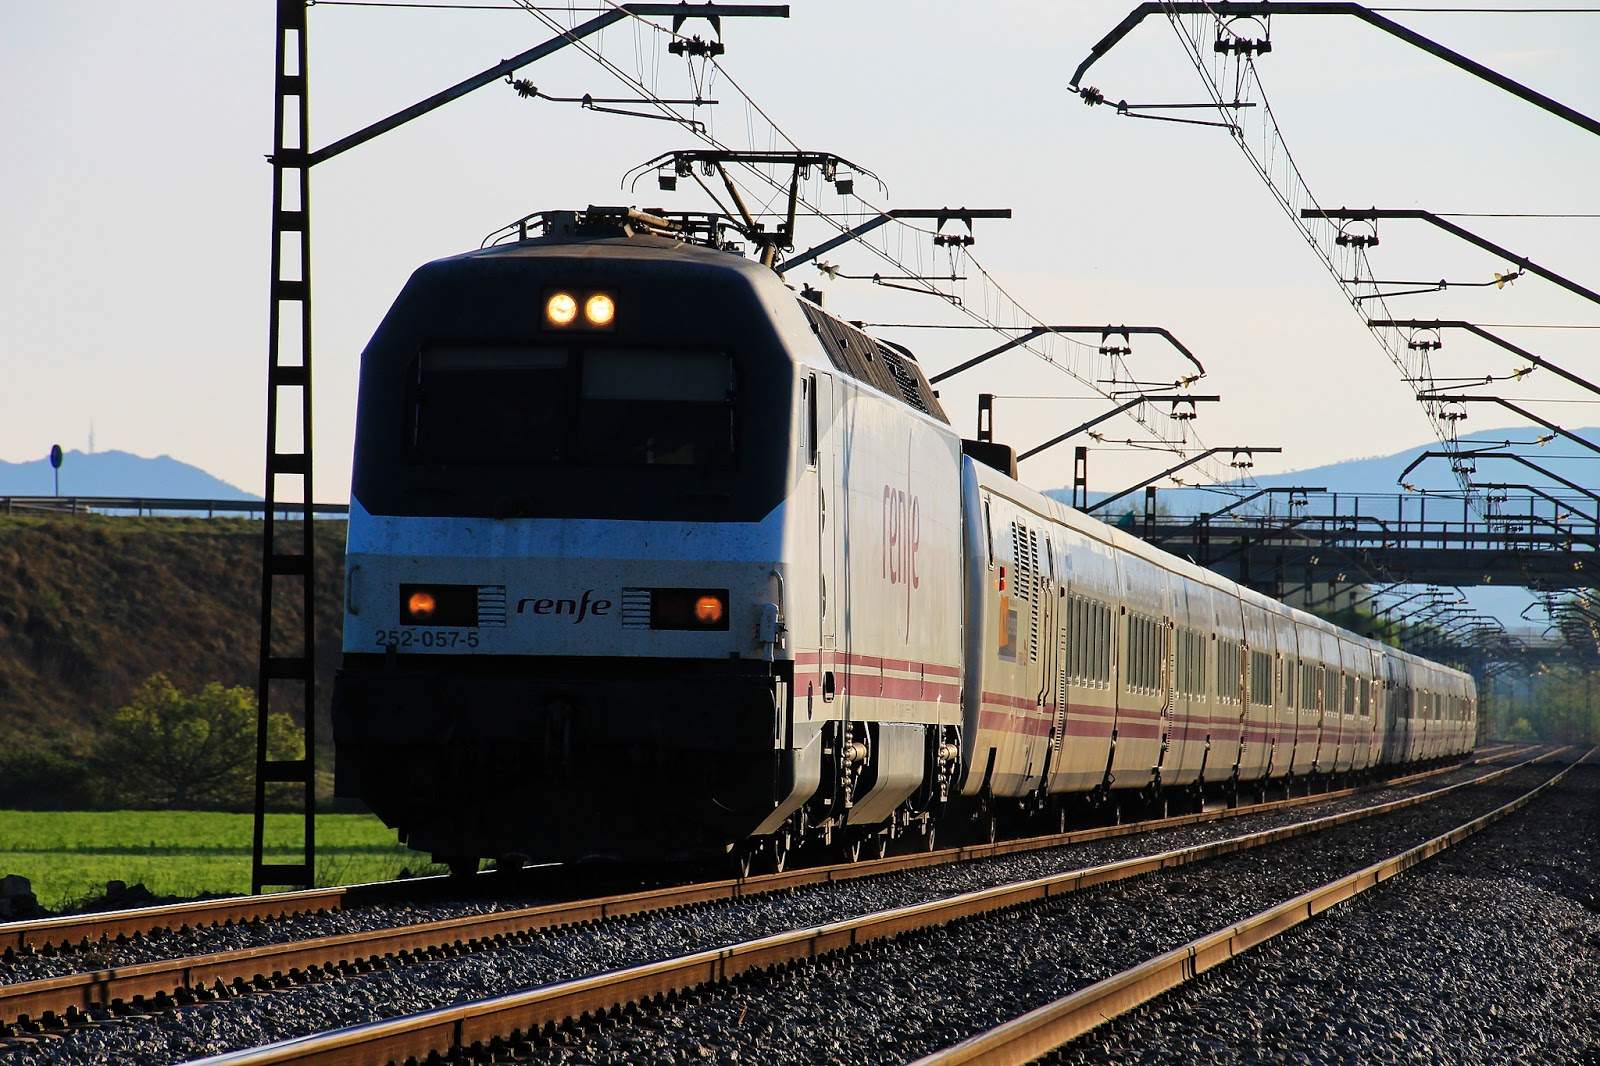 Memorias de un tren for Trenhotel de barcelona a paris